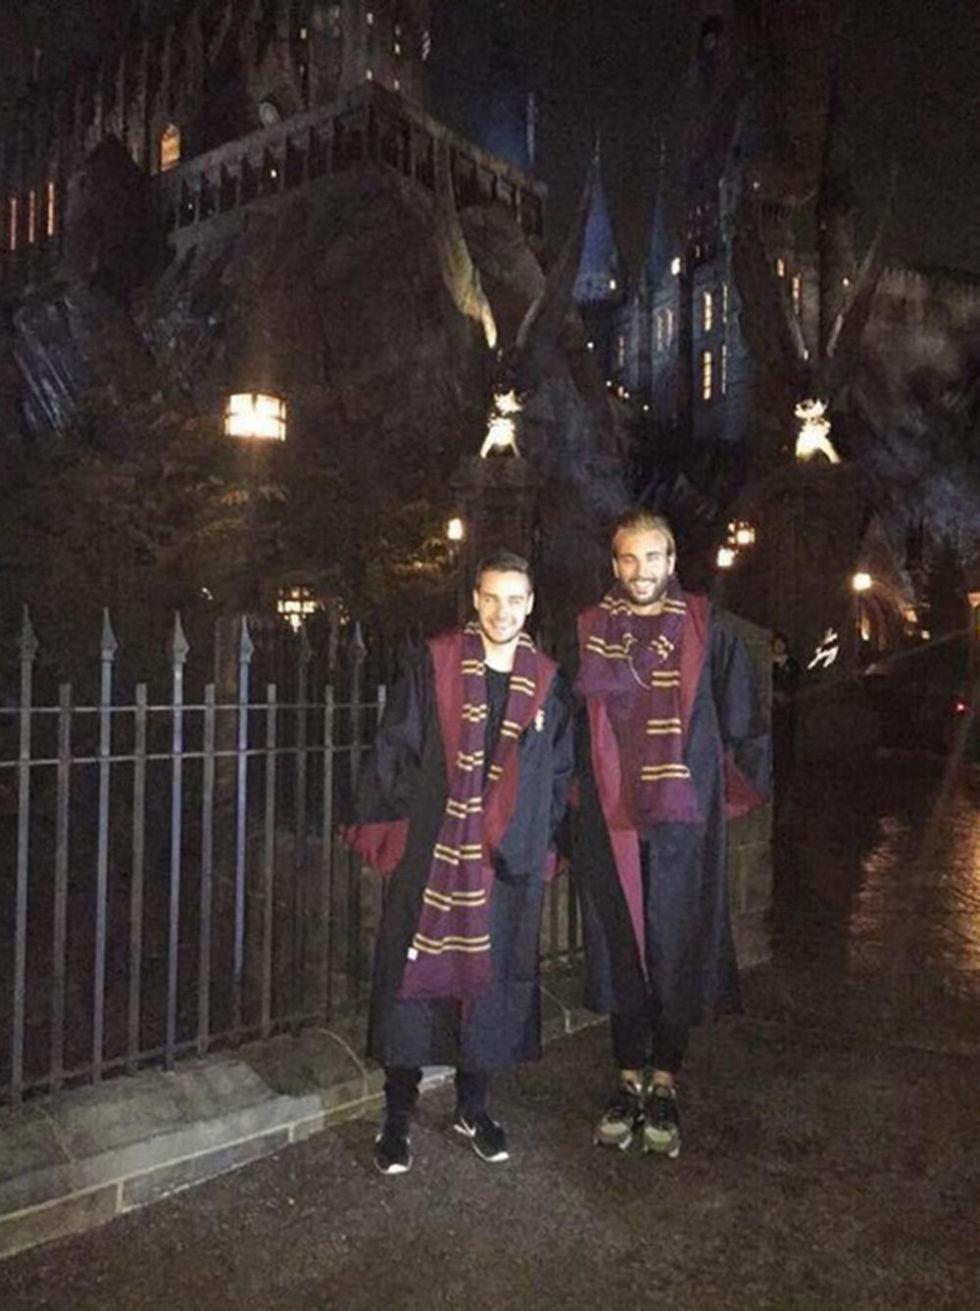 Groovy The Biggest Harry Potter Shrine Its In Liam Paynes Back Garden Funny Birthday Cards Online Hendilapandamsfinfo